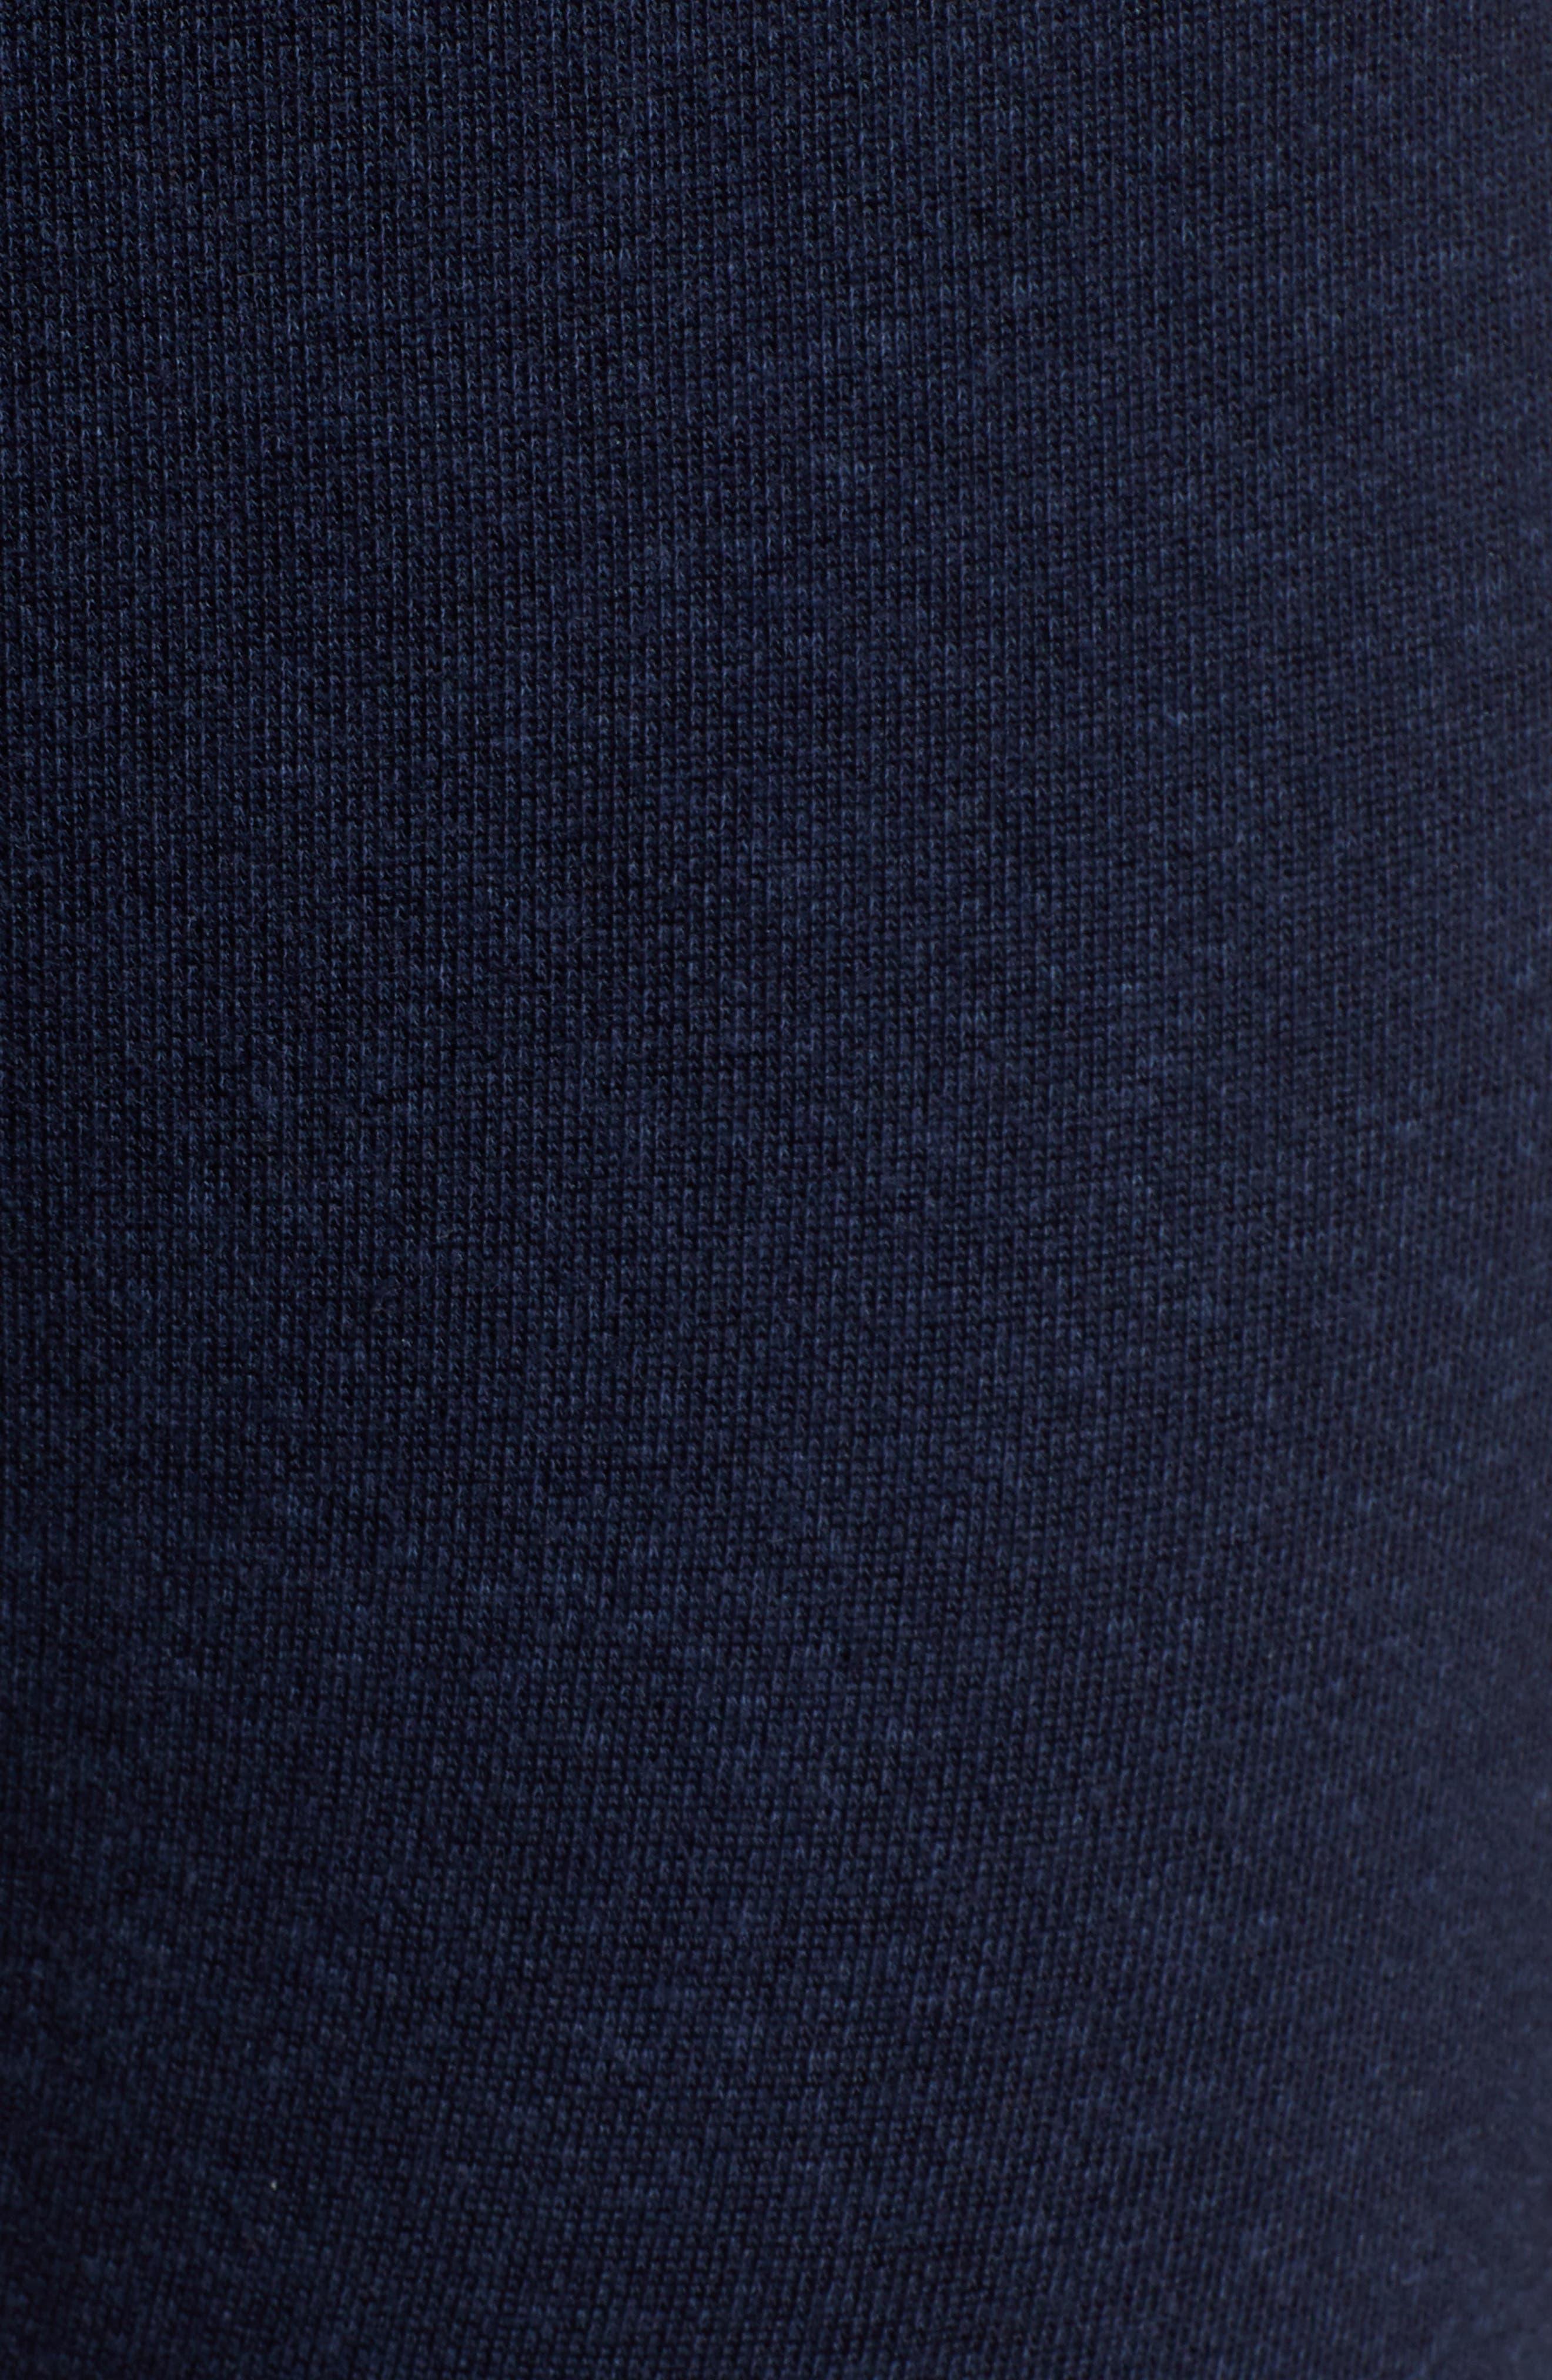 Midnight Stripe Cuff Cotton Blend Sweatpants,                             Alternate thumbnail 5, color,                             MIDNIGHT